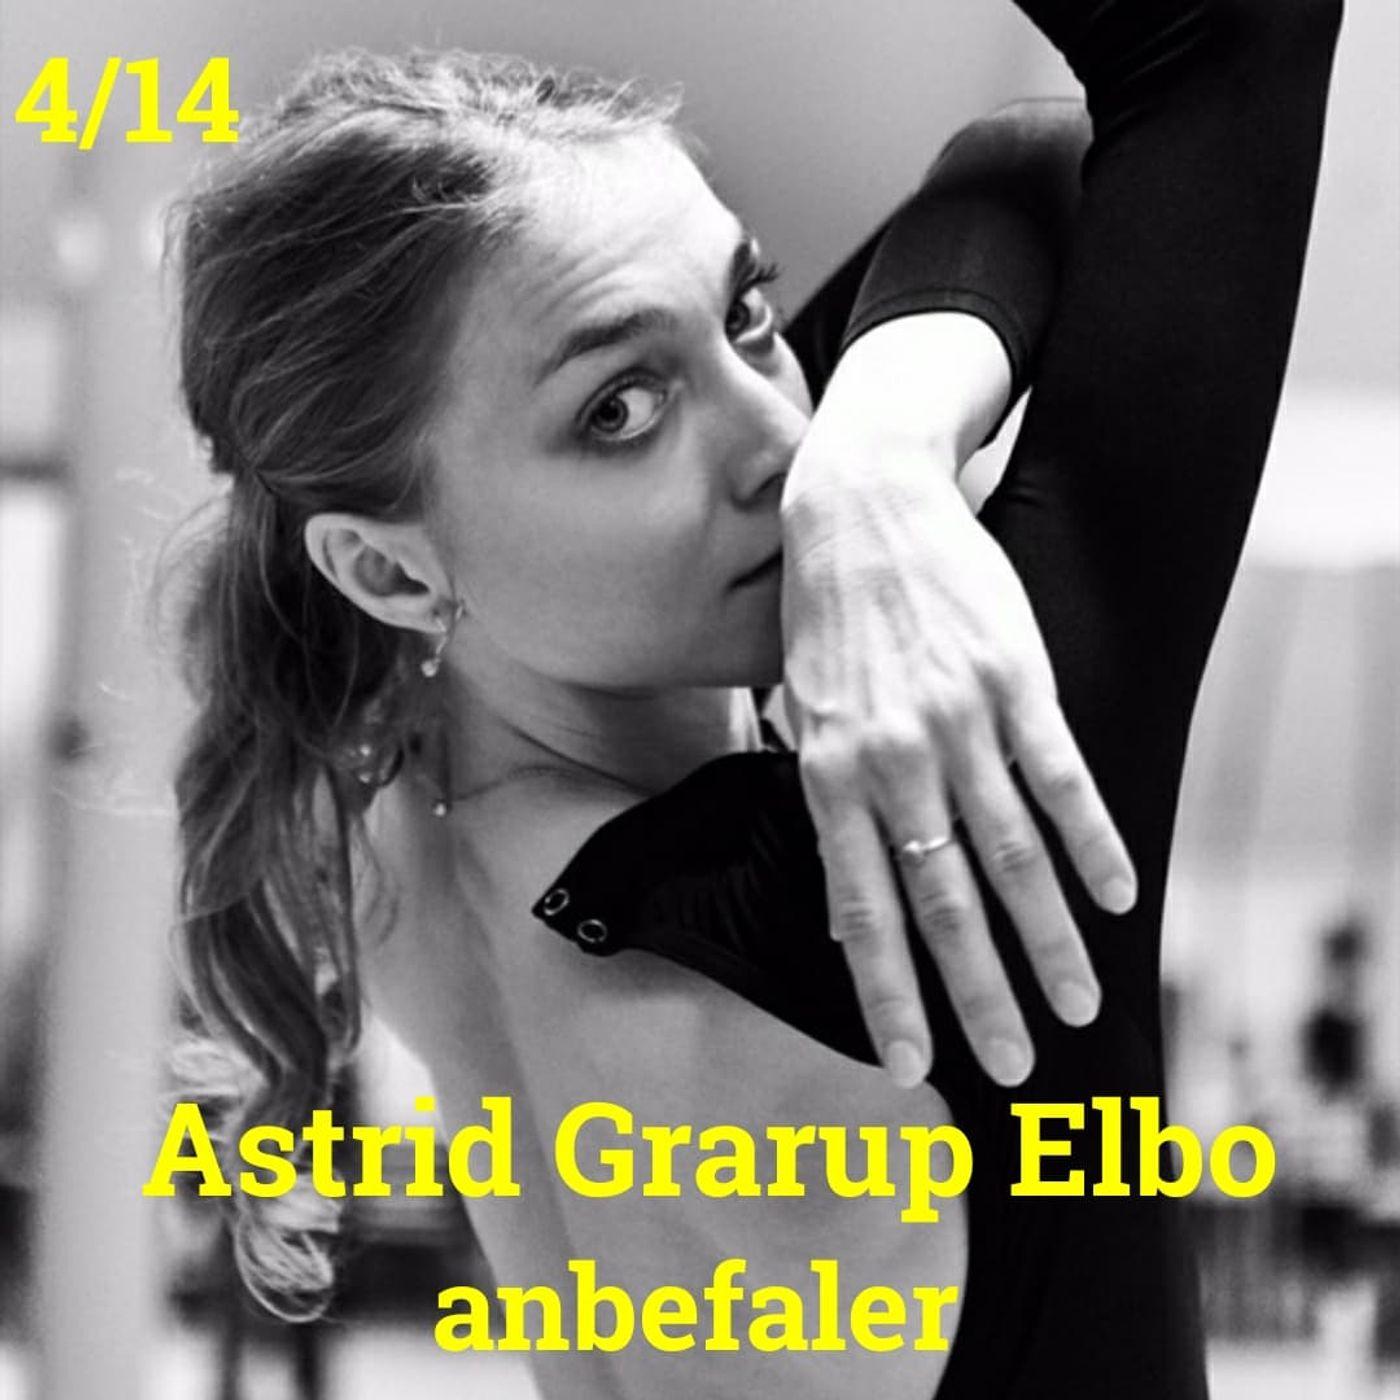 Karantæne dag 4 - med Astrid Grarup Elbo & Nonsens